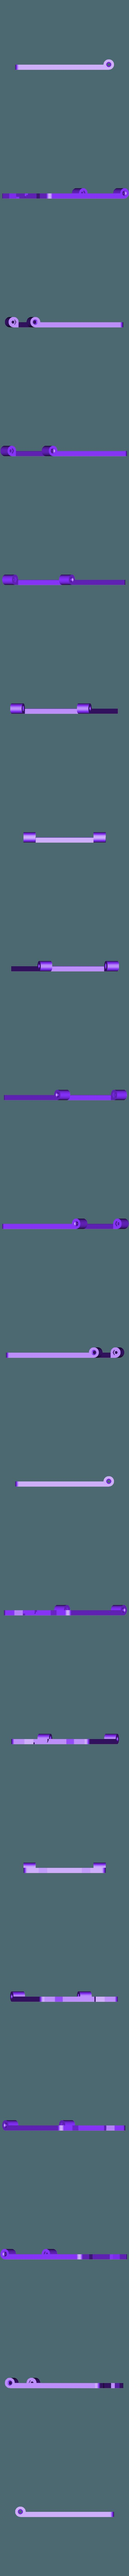 faceBv3.STL Download free STL file Tic Tac Toe • 3D printable design, seb2320